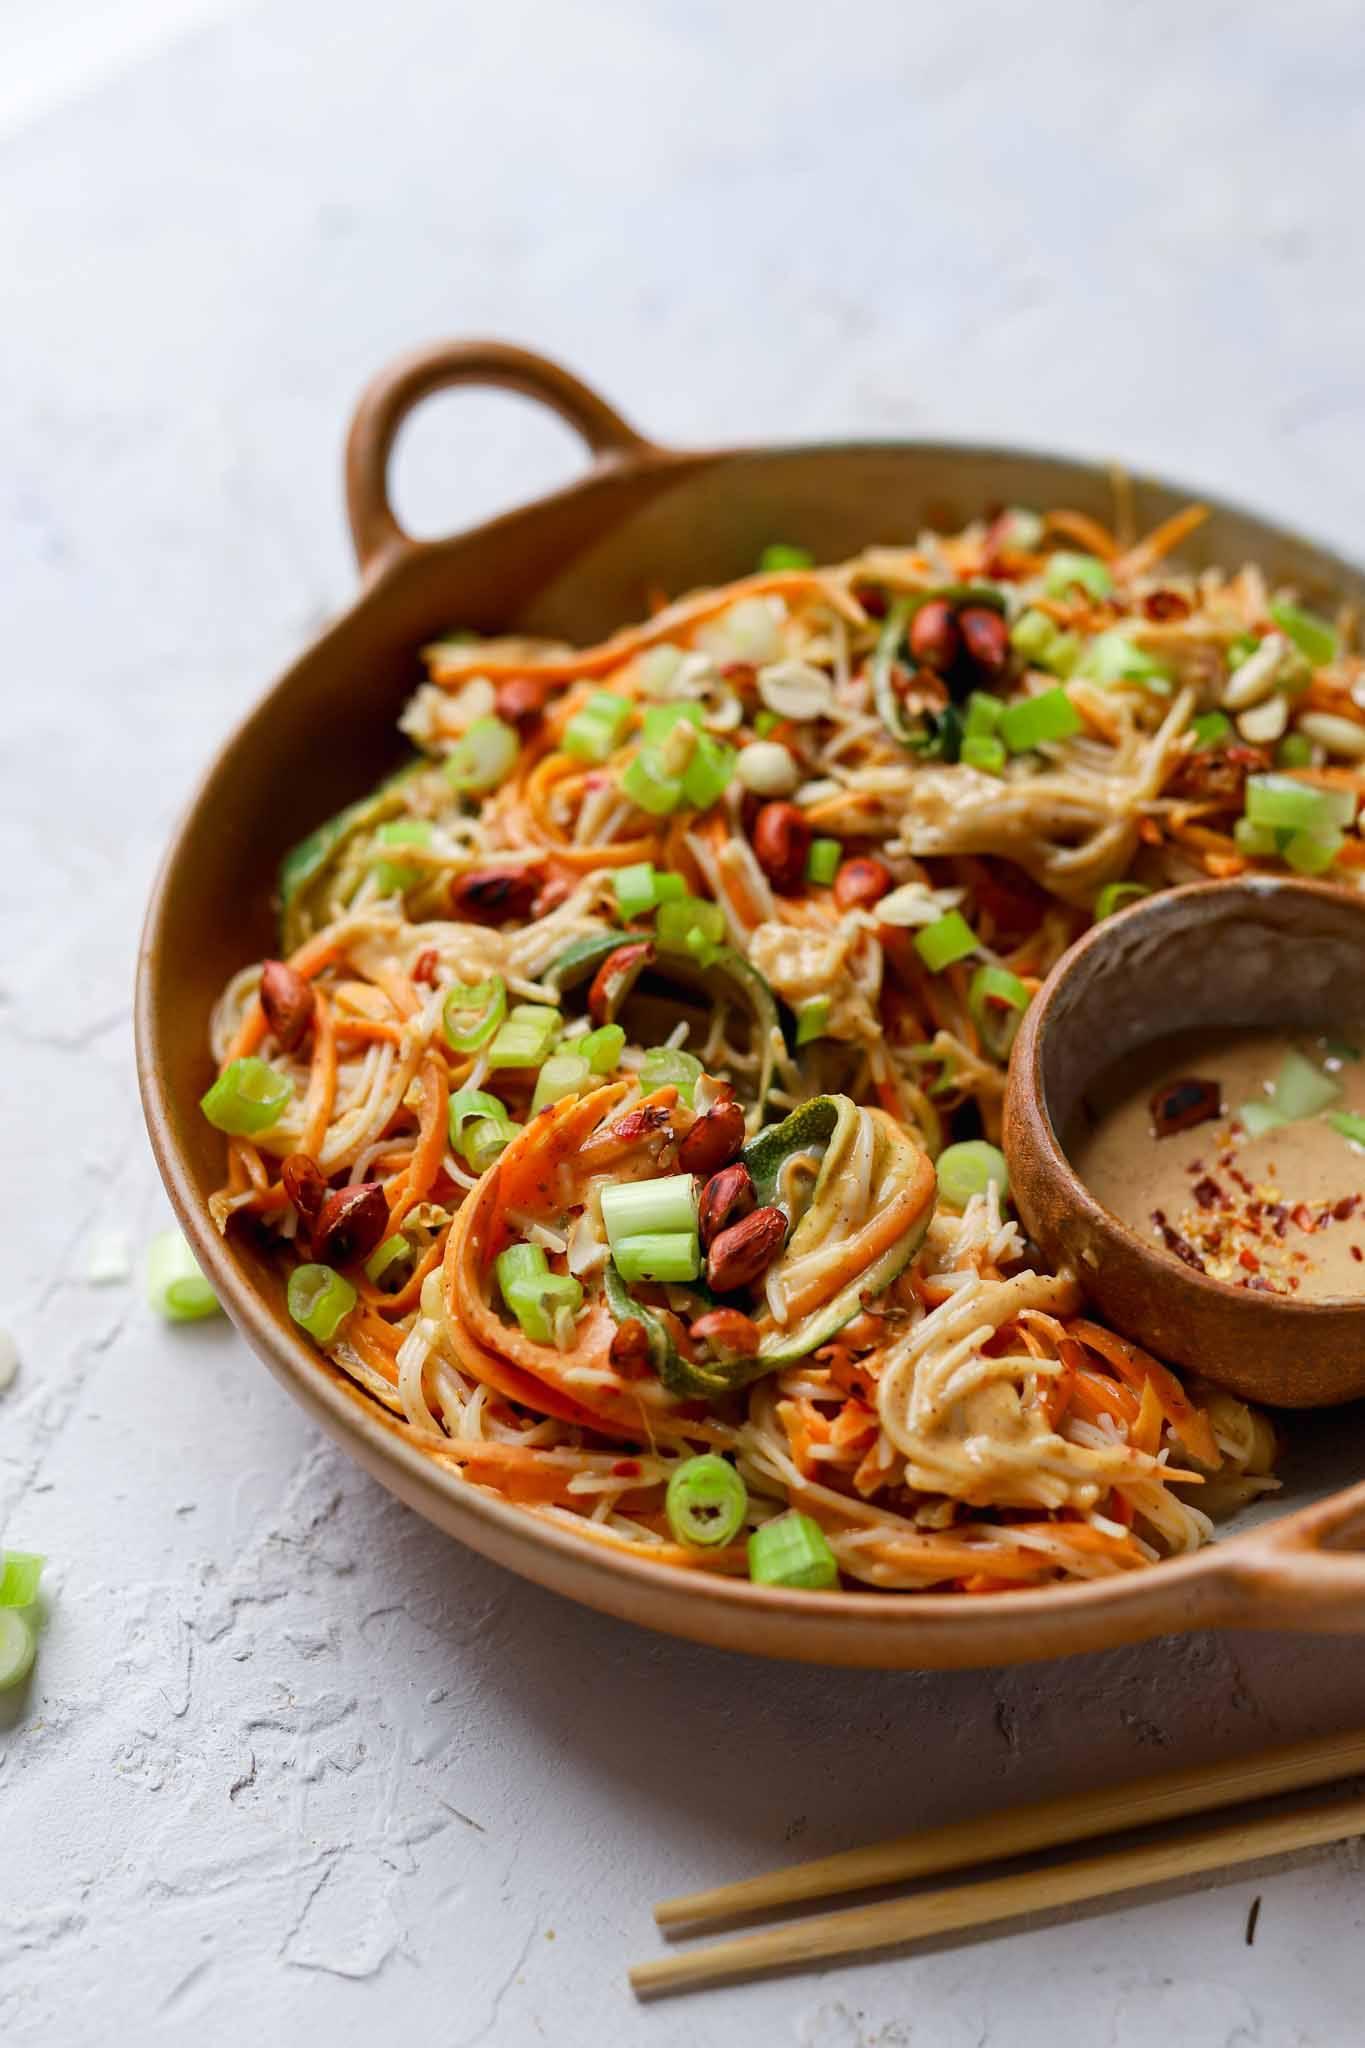 vegetable noodles and peanut dressing